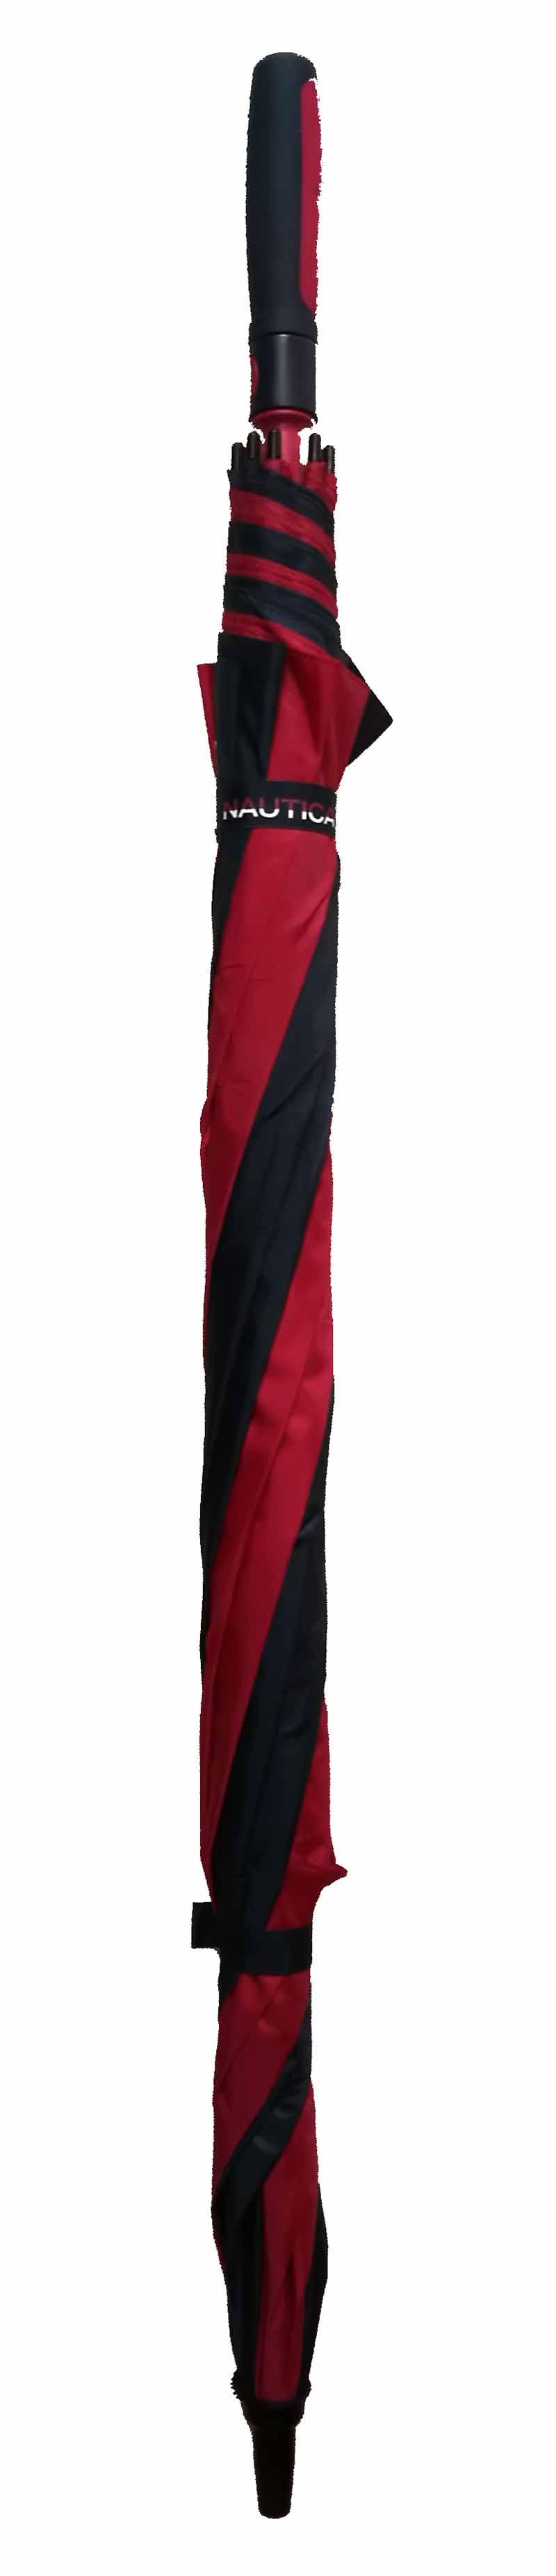 Sombrilla de golf Nautica roja 68 02